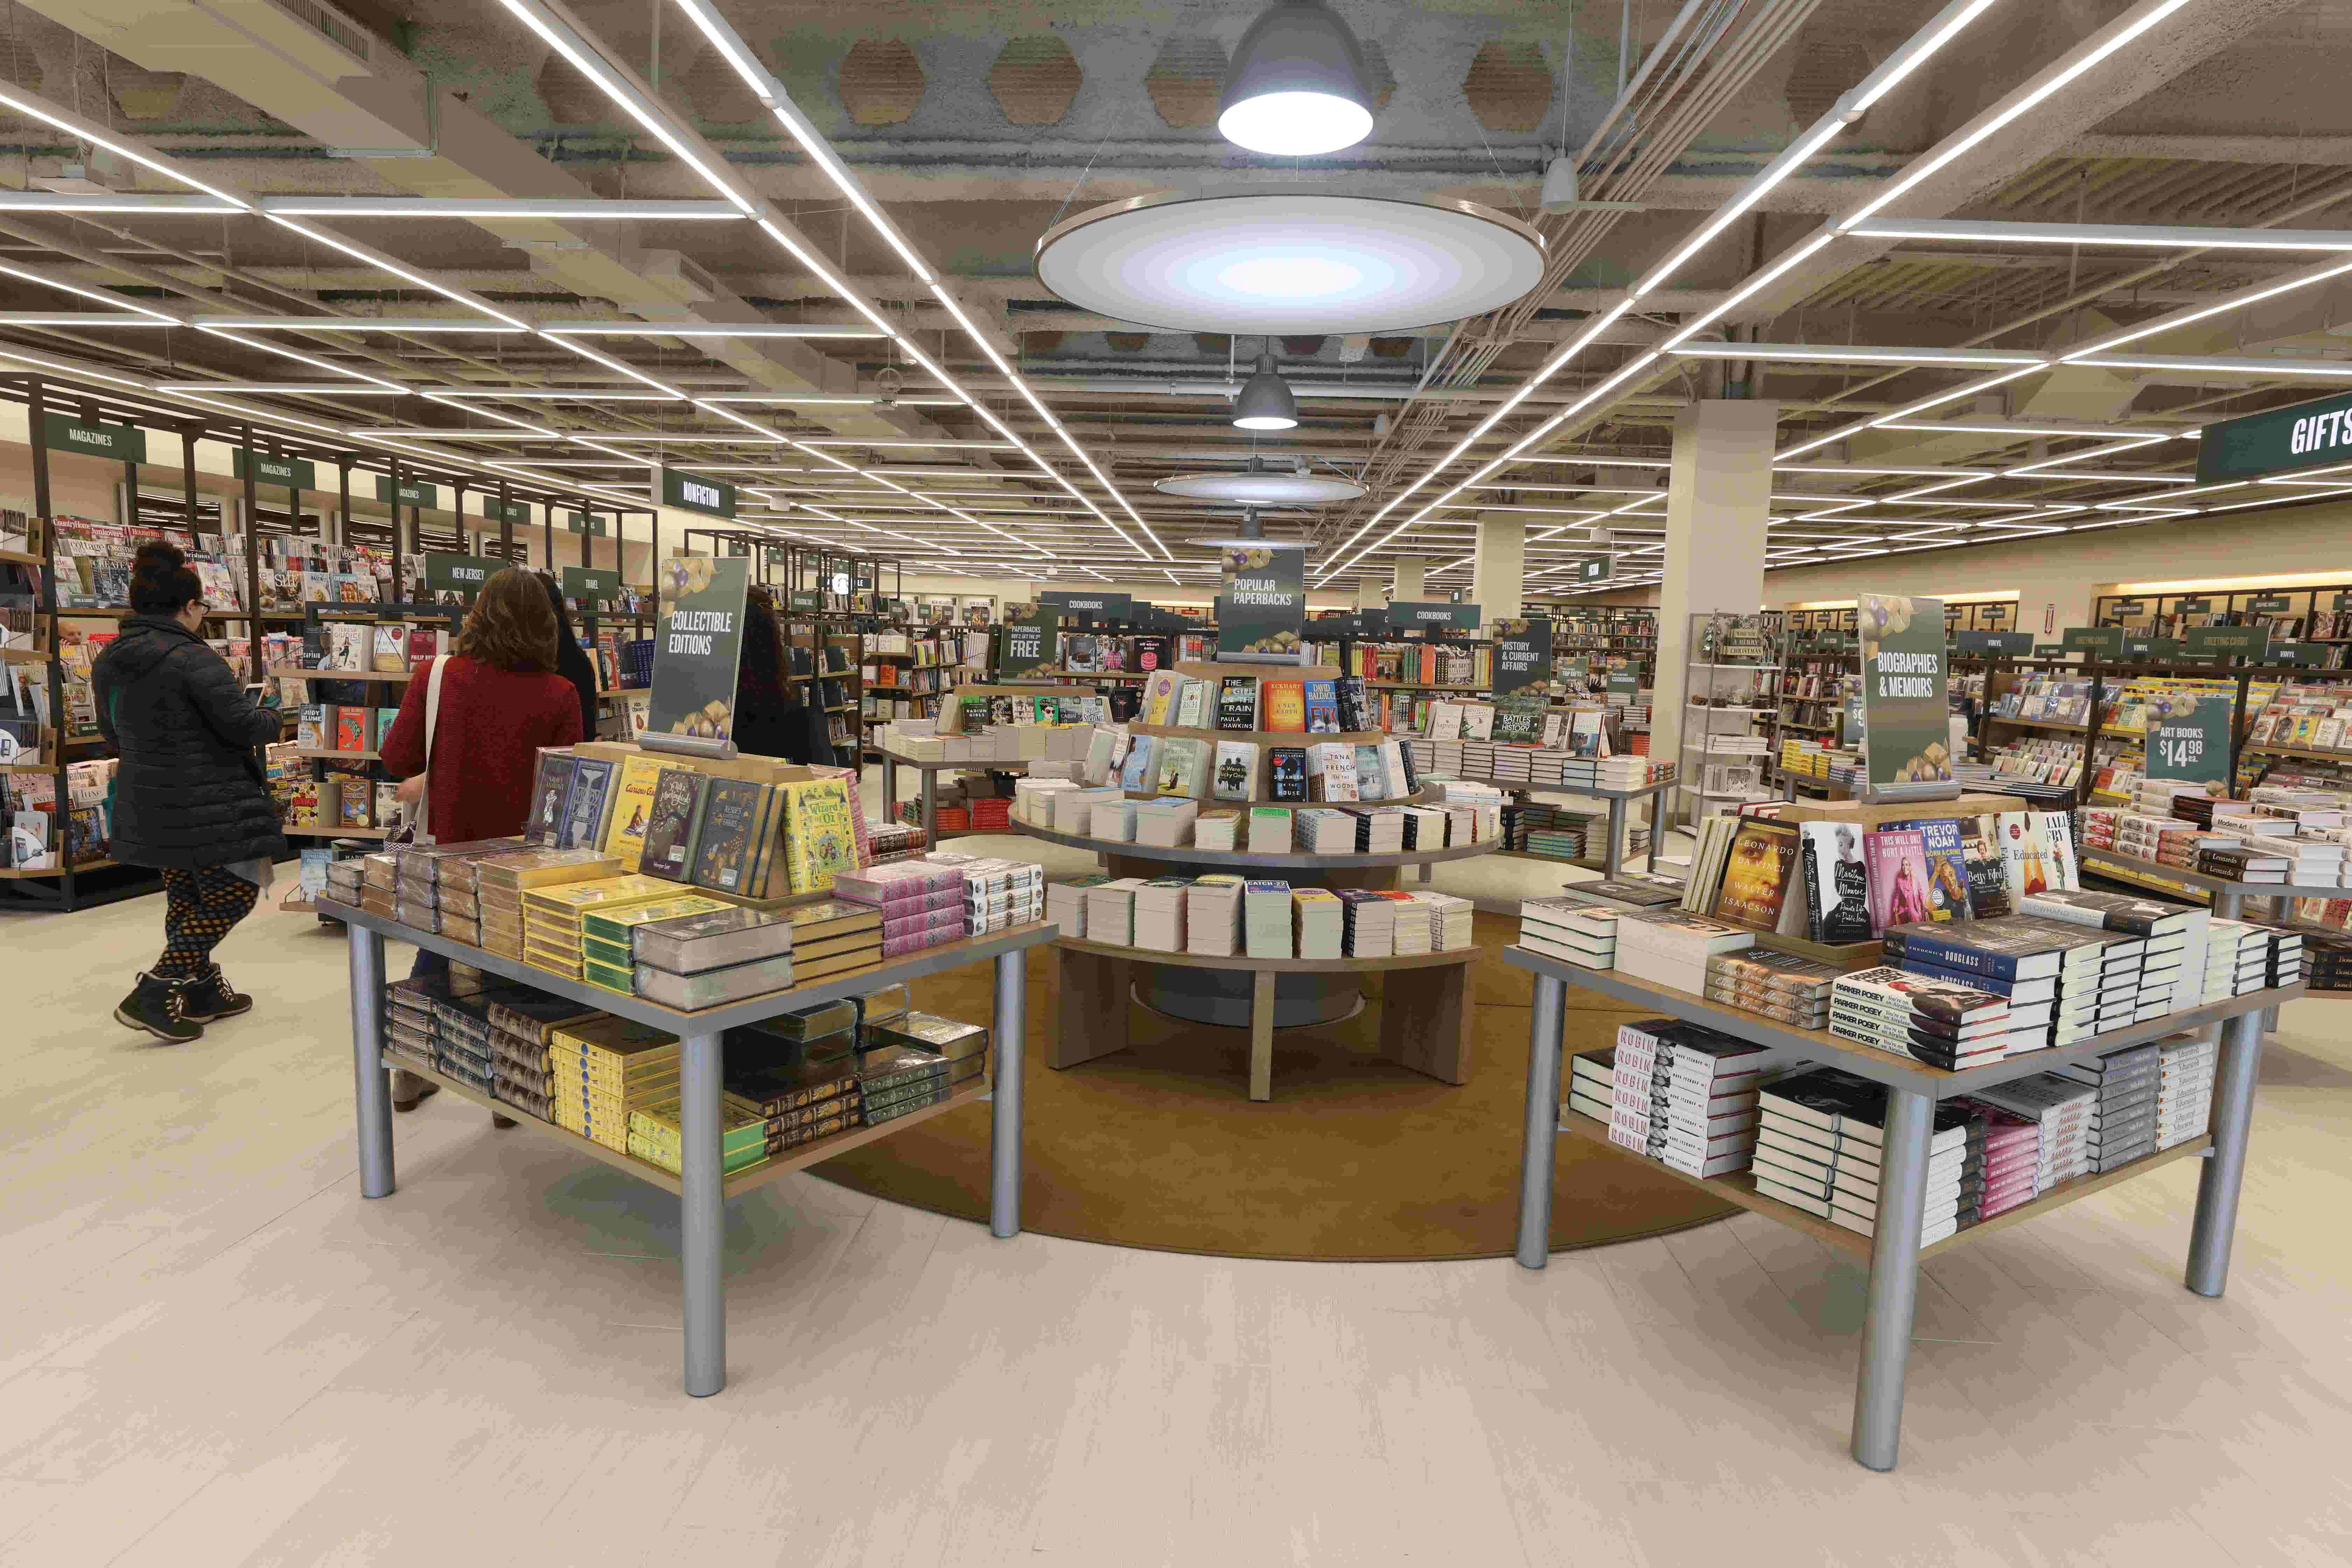 Barnes Noble S First Prototype Store In Nj Opens In Hackensack